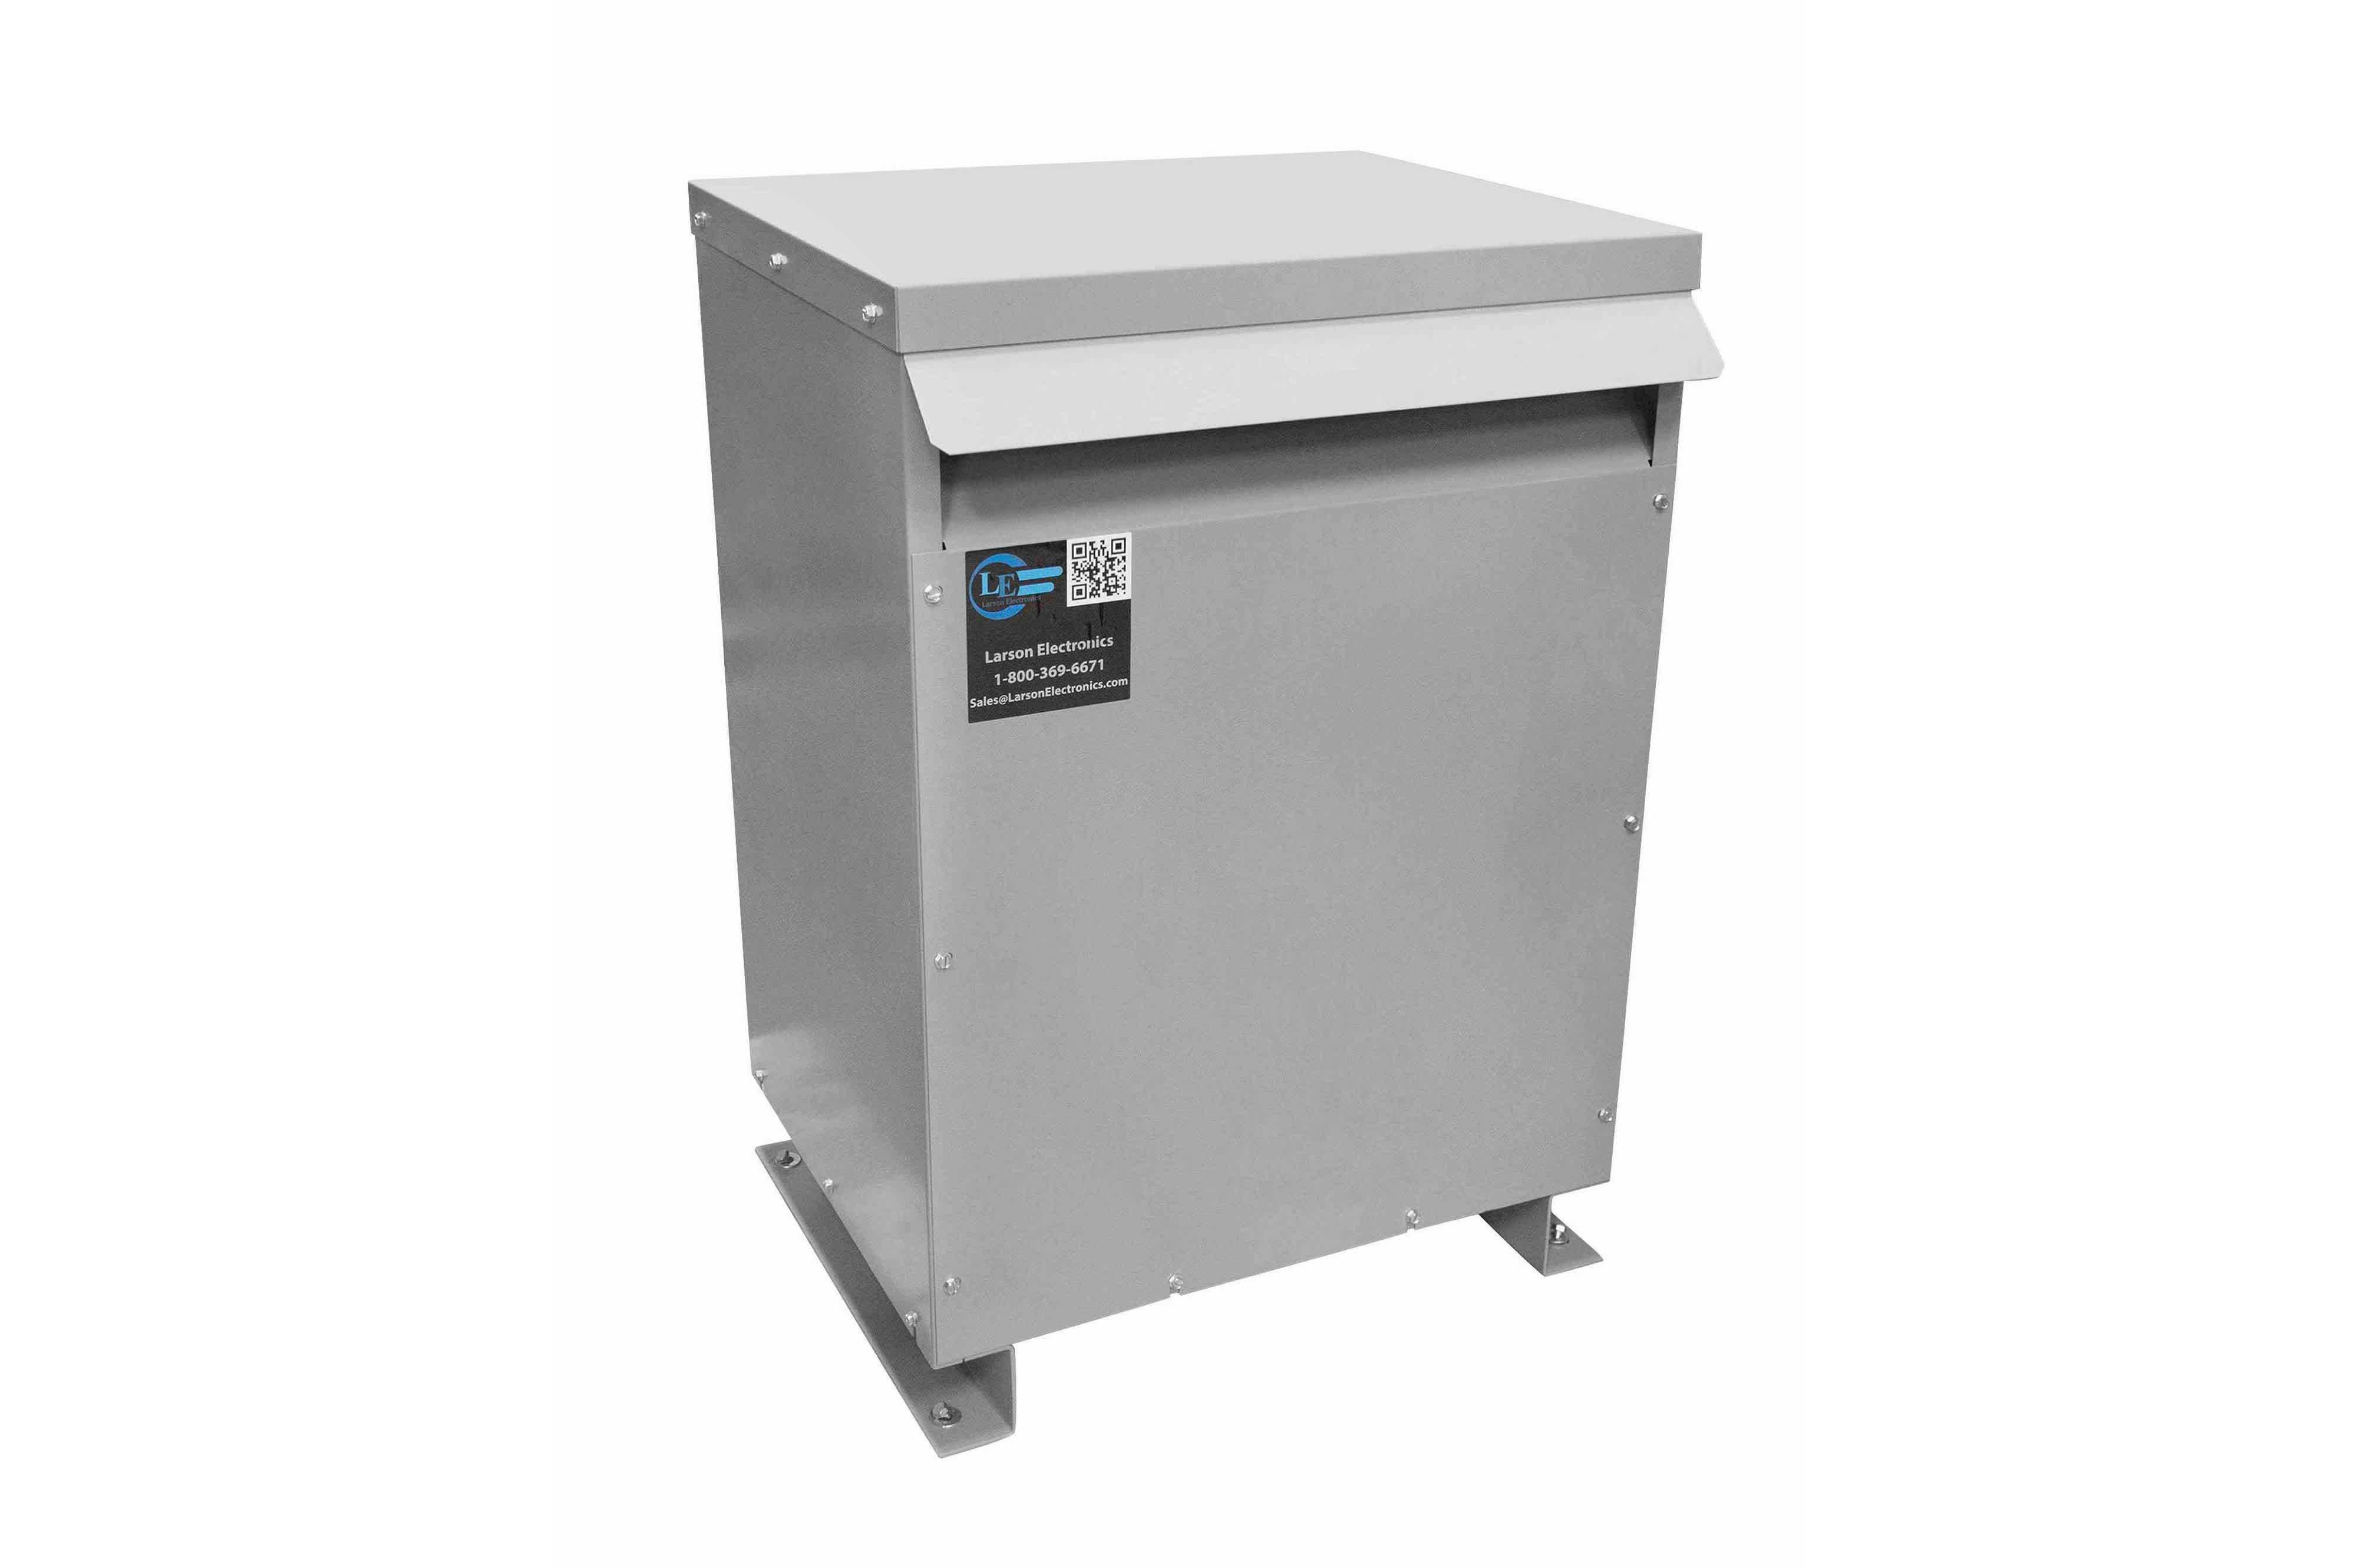 30 kVA 3PH DOE Transformer, 480V Delta Primary, 575Y/332 Wye-N Secondary, N3R, Ventilated, 60 Hz